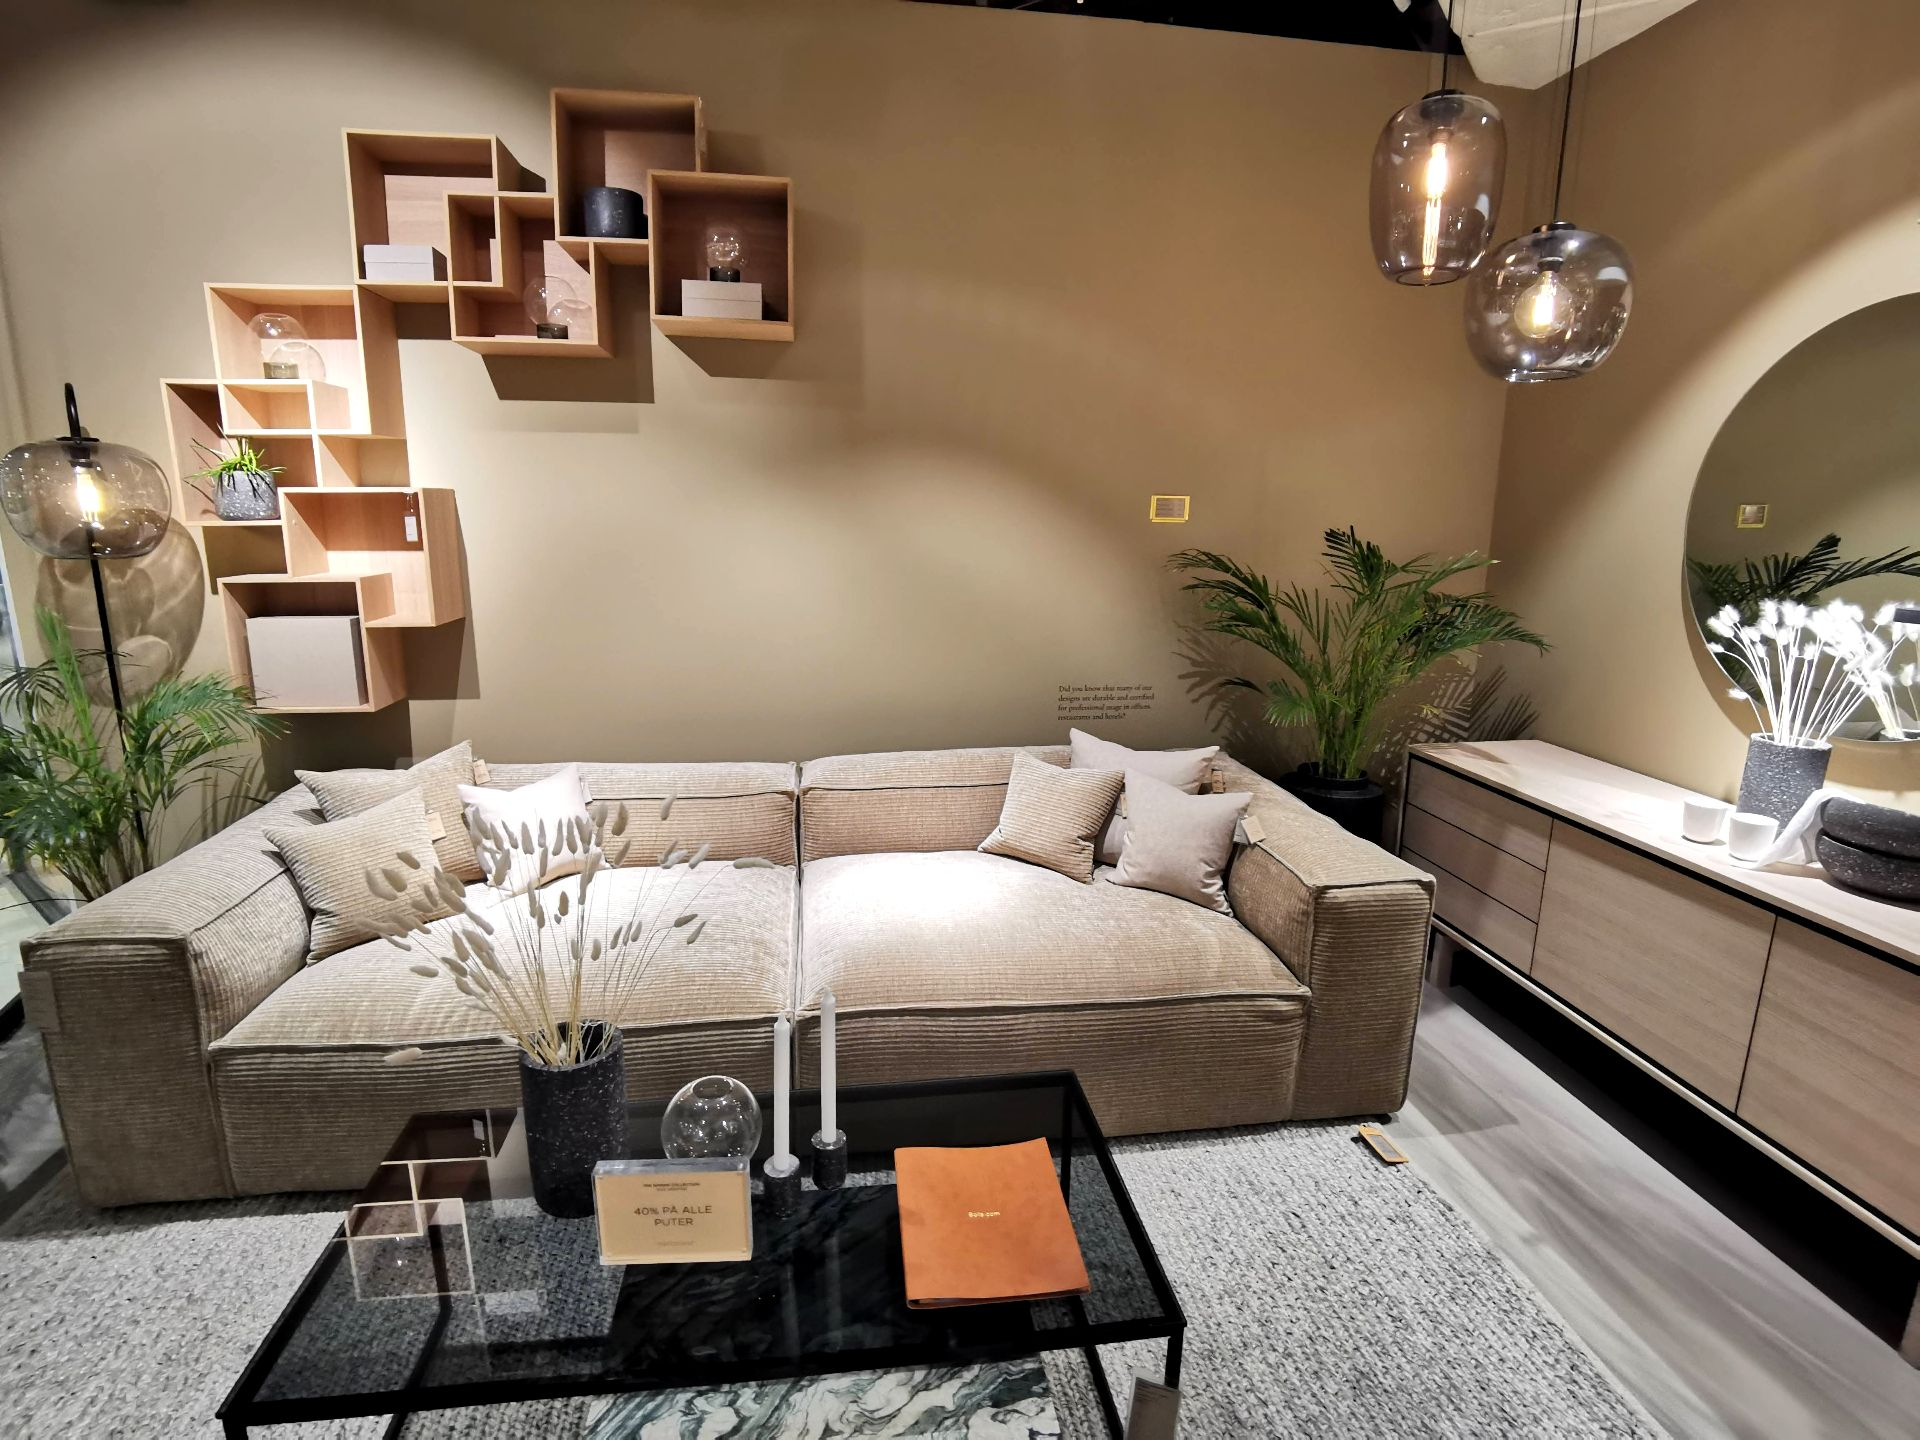 Scandinavian Living Room Design Tour Living Room Scandinavian Scandinavian Design Living Room Scandinavian Furniture Design Inspire me home decor living room gif